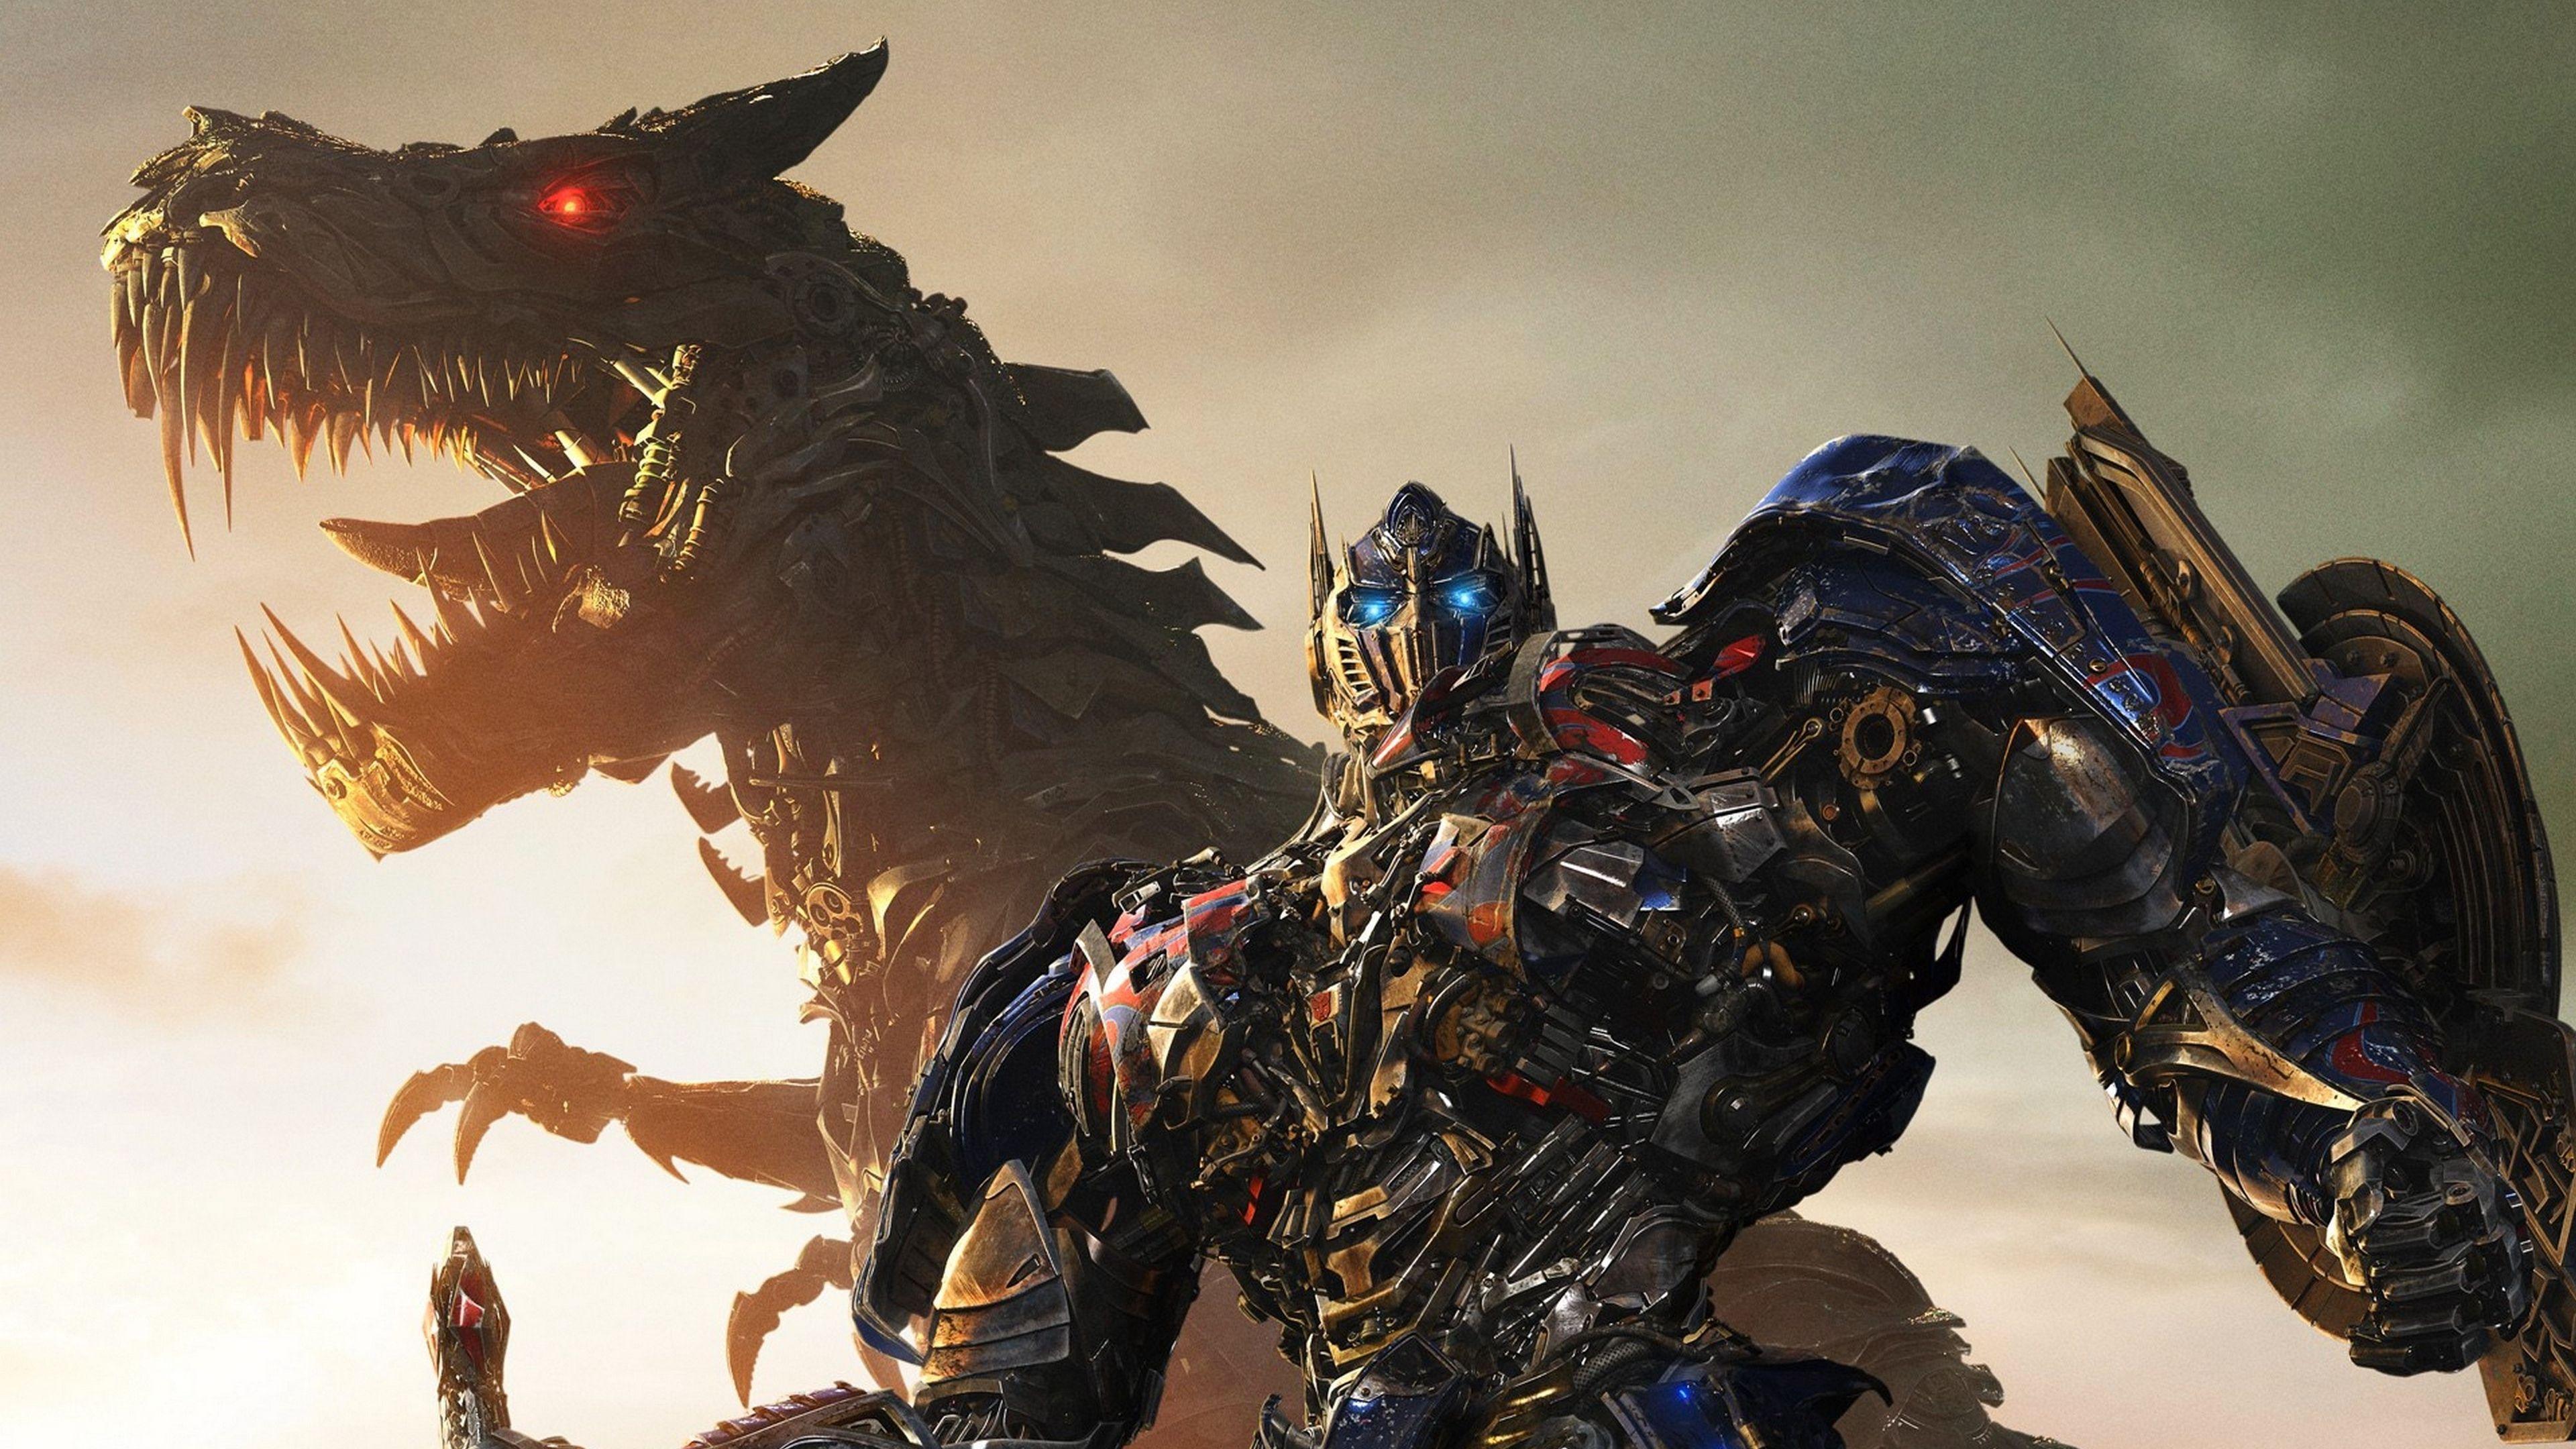 4K Transformers Wallpapers - Top Free